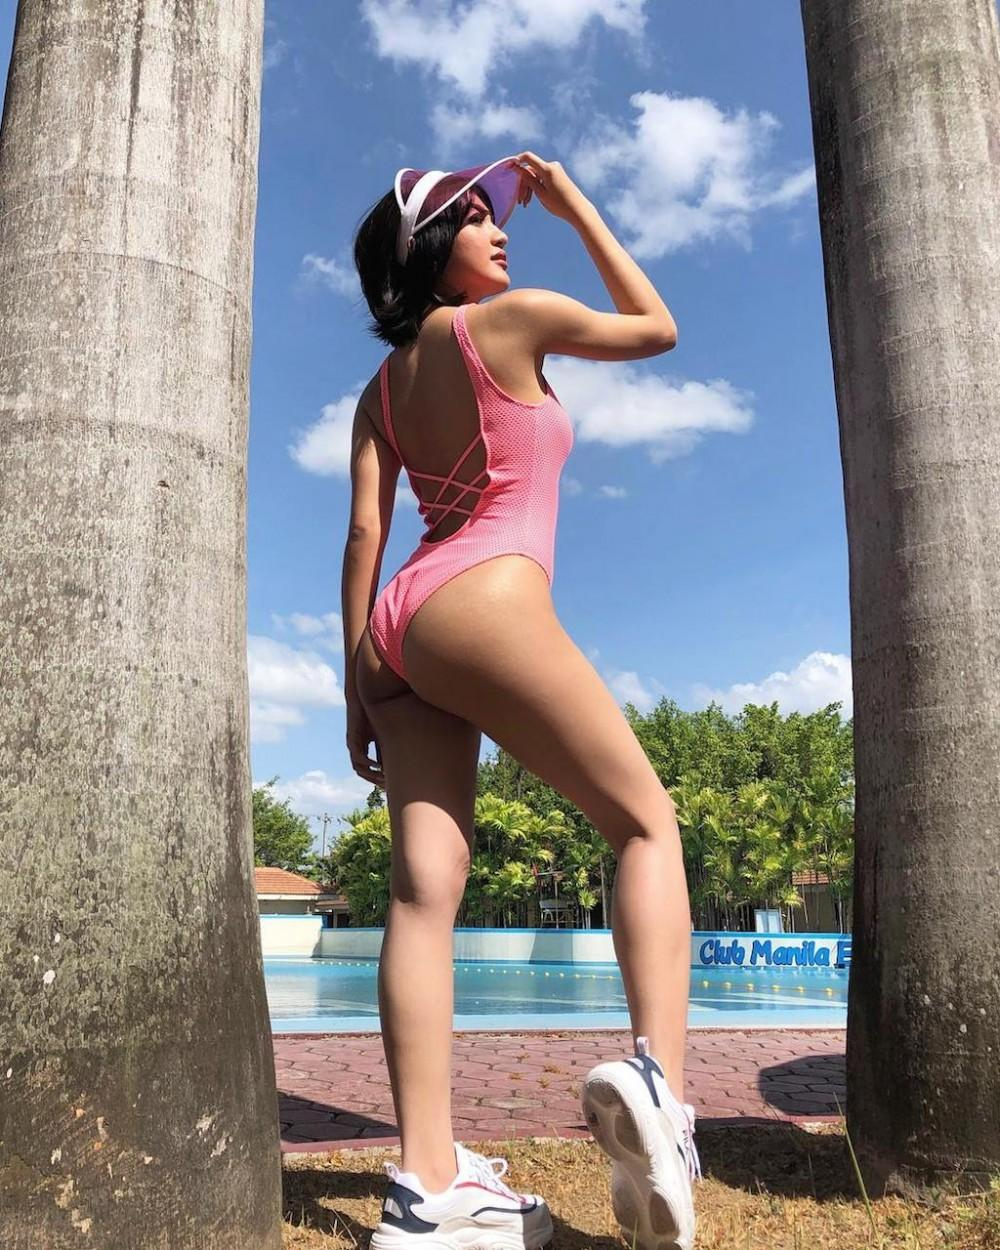 Julie Ann Hot look: julie anne san jose flaunts her curves in swimsuit